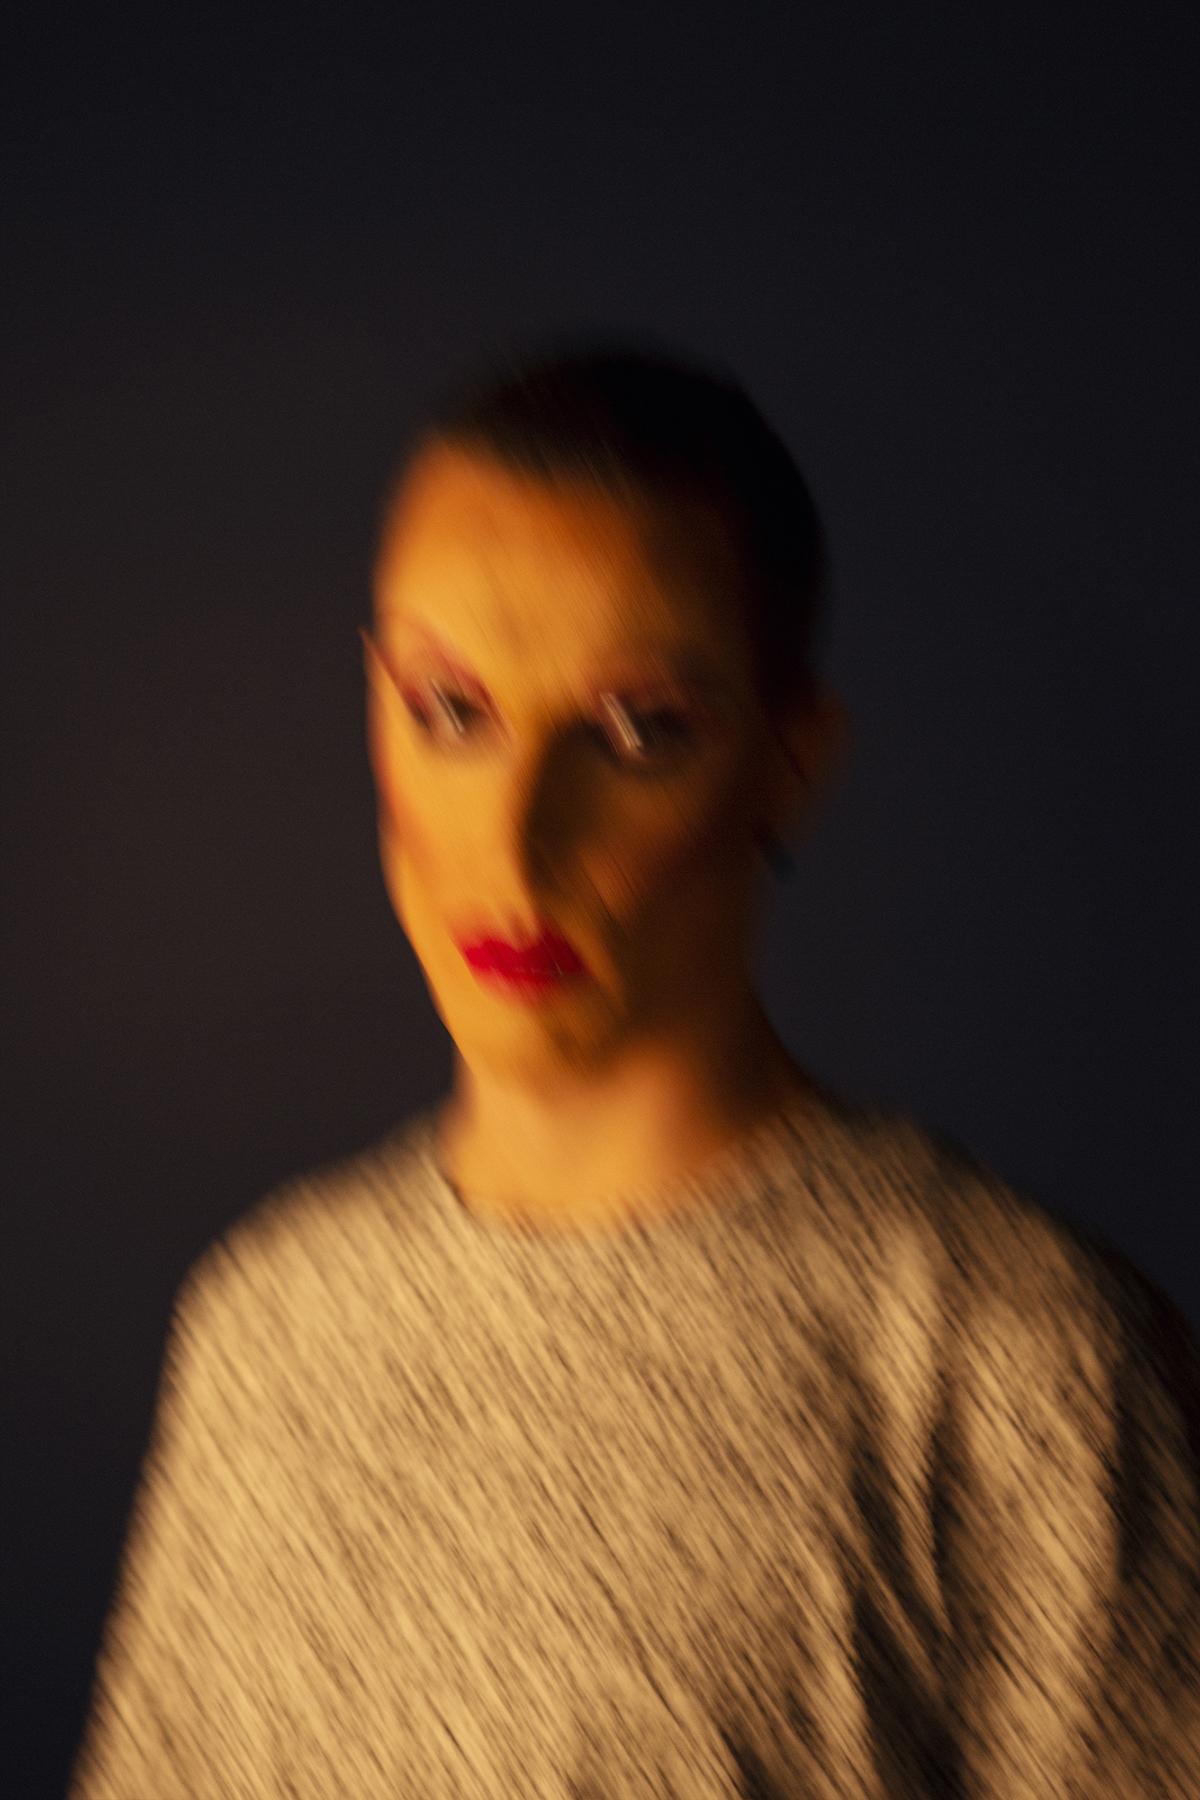 01_pugili_music_portrait_federica_borgato